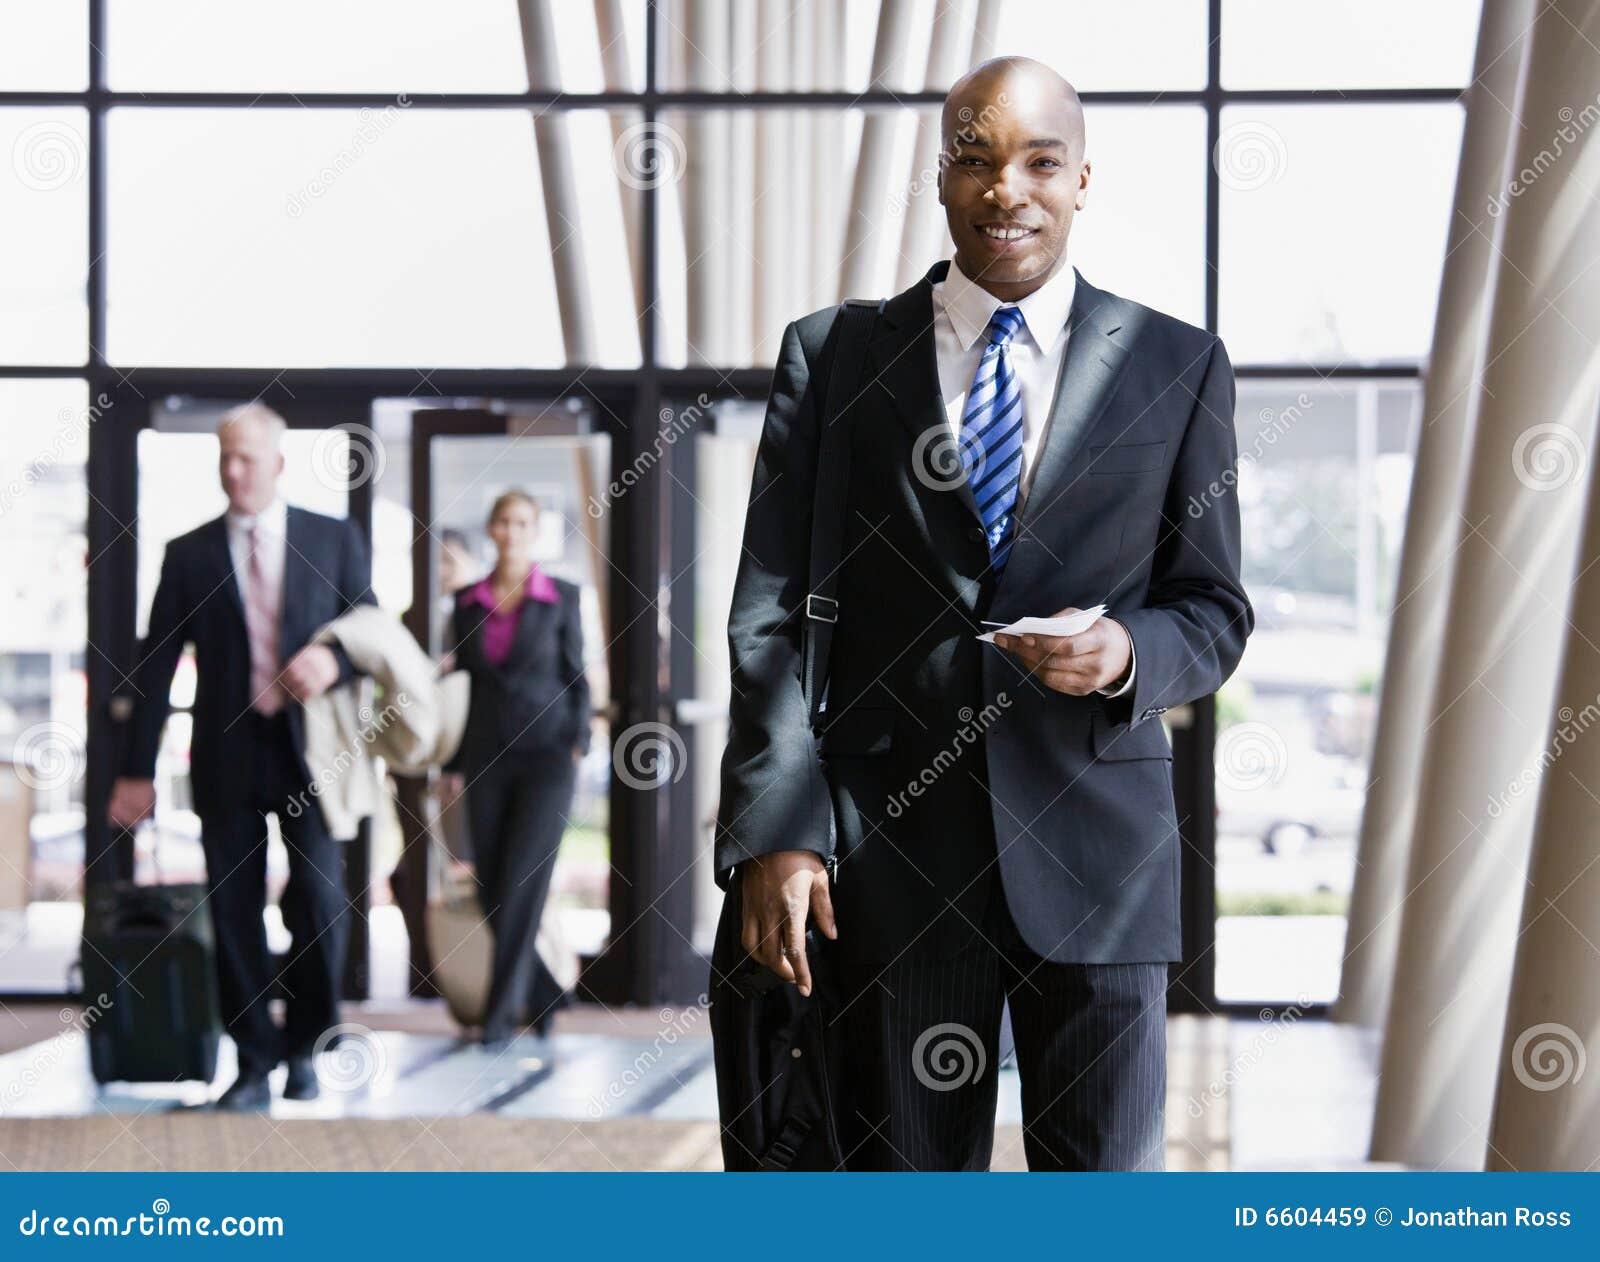 Business traveler holding briefcase, passport